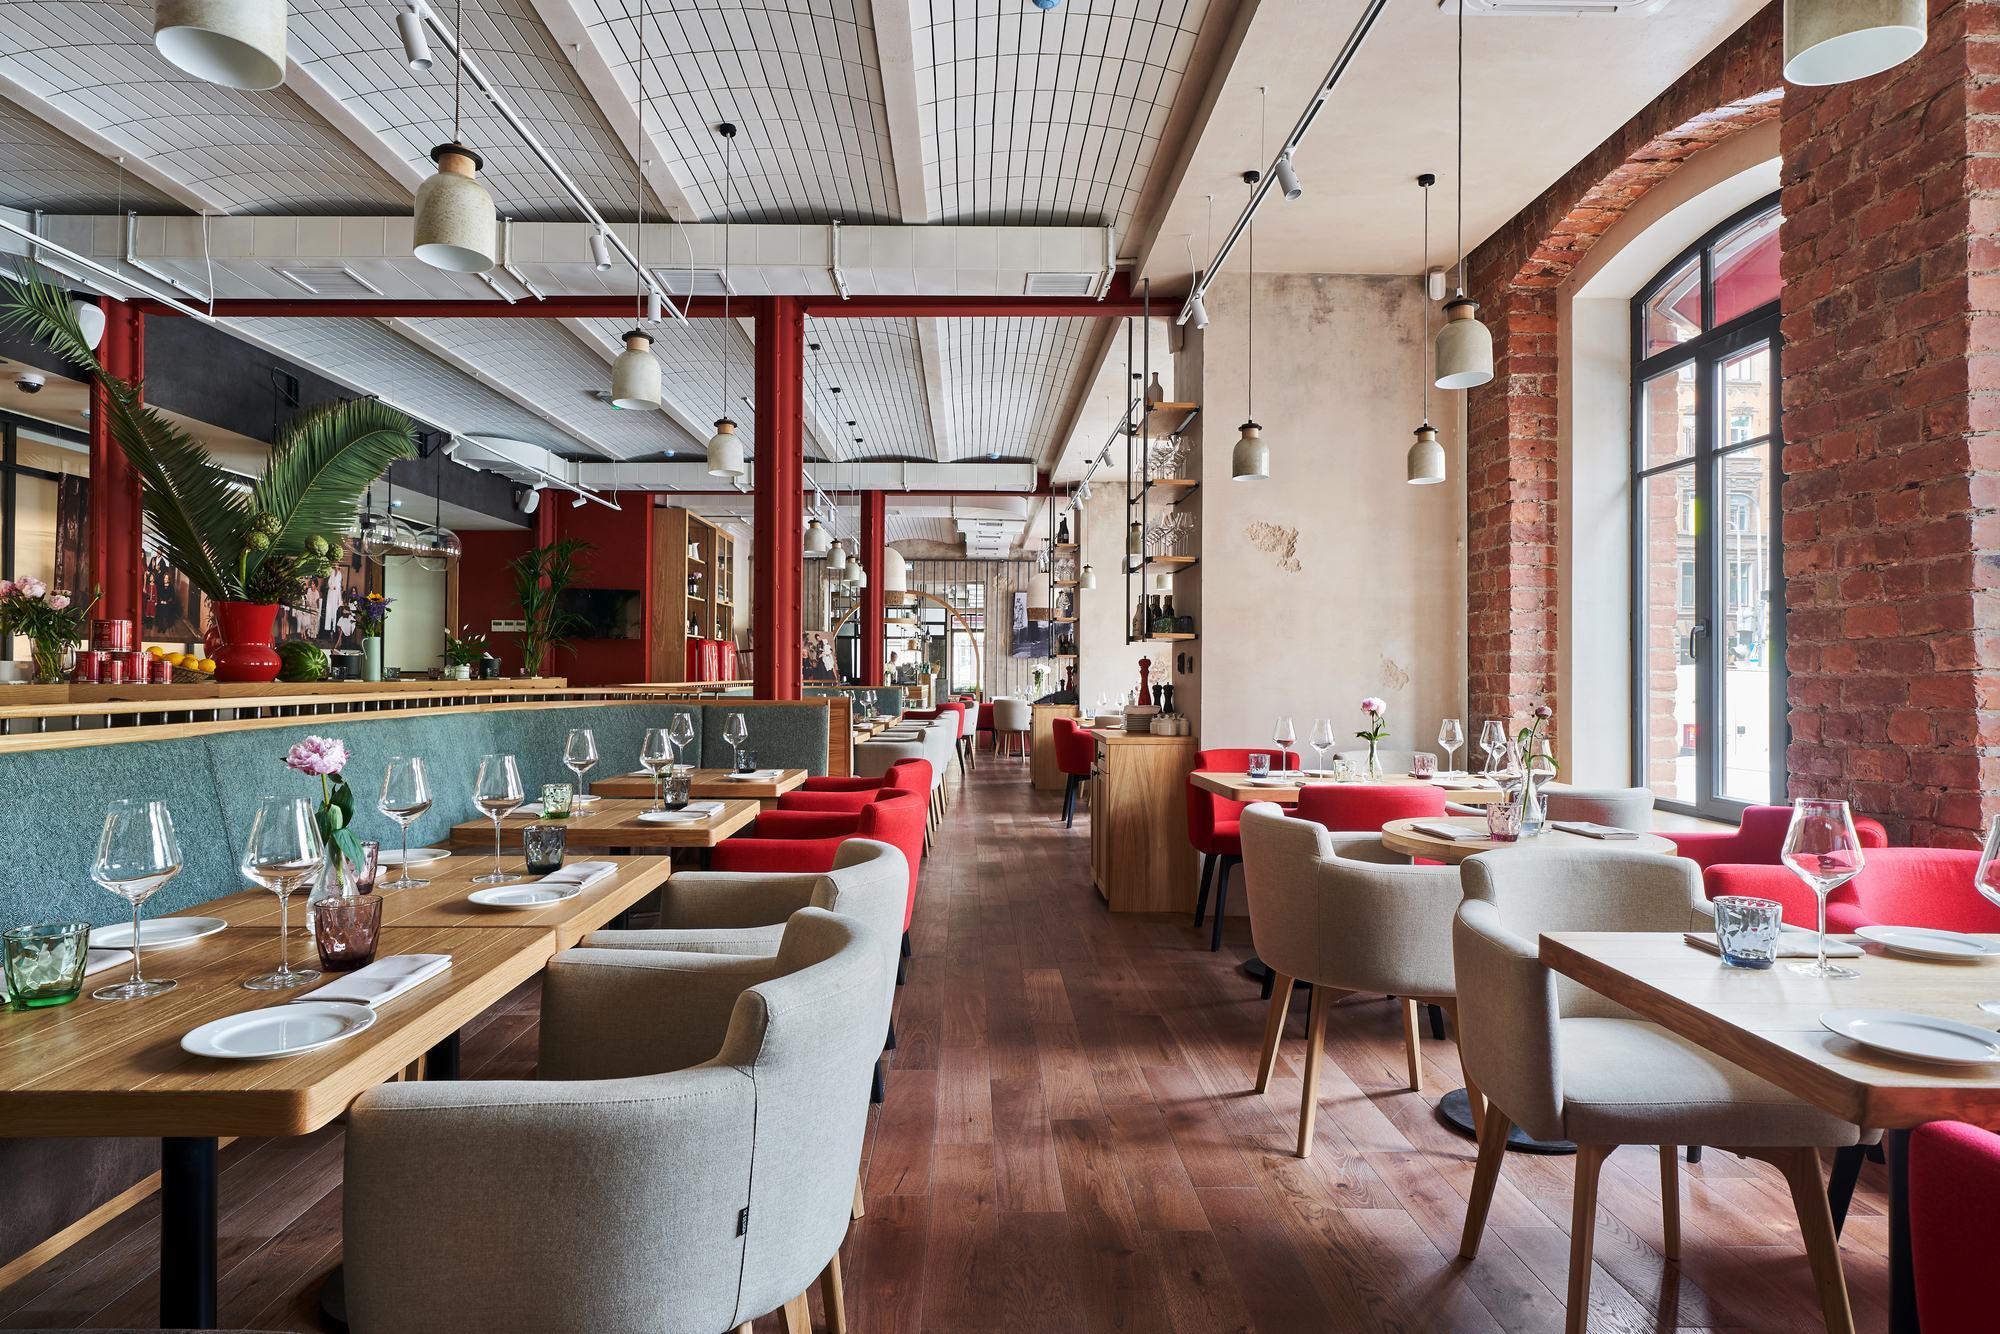 Italy Restaurant / PAUM design | ArchDaily